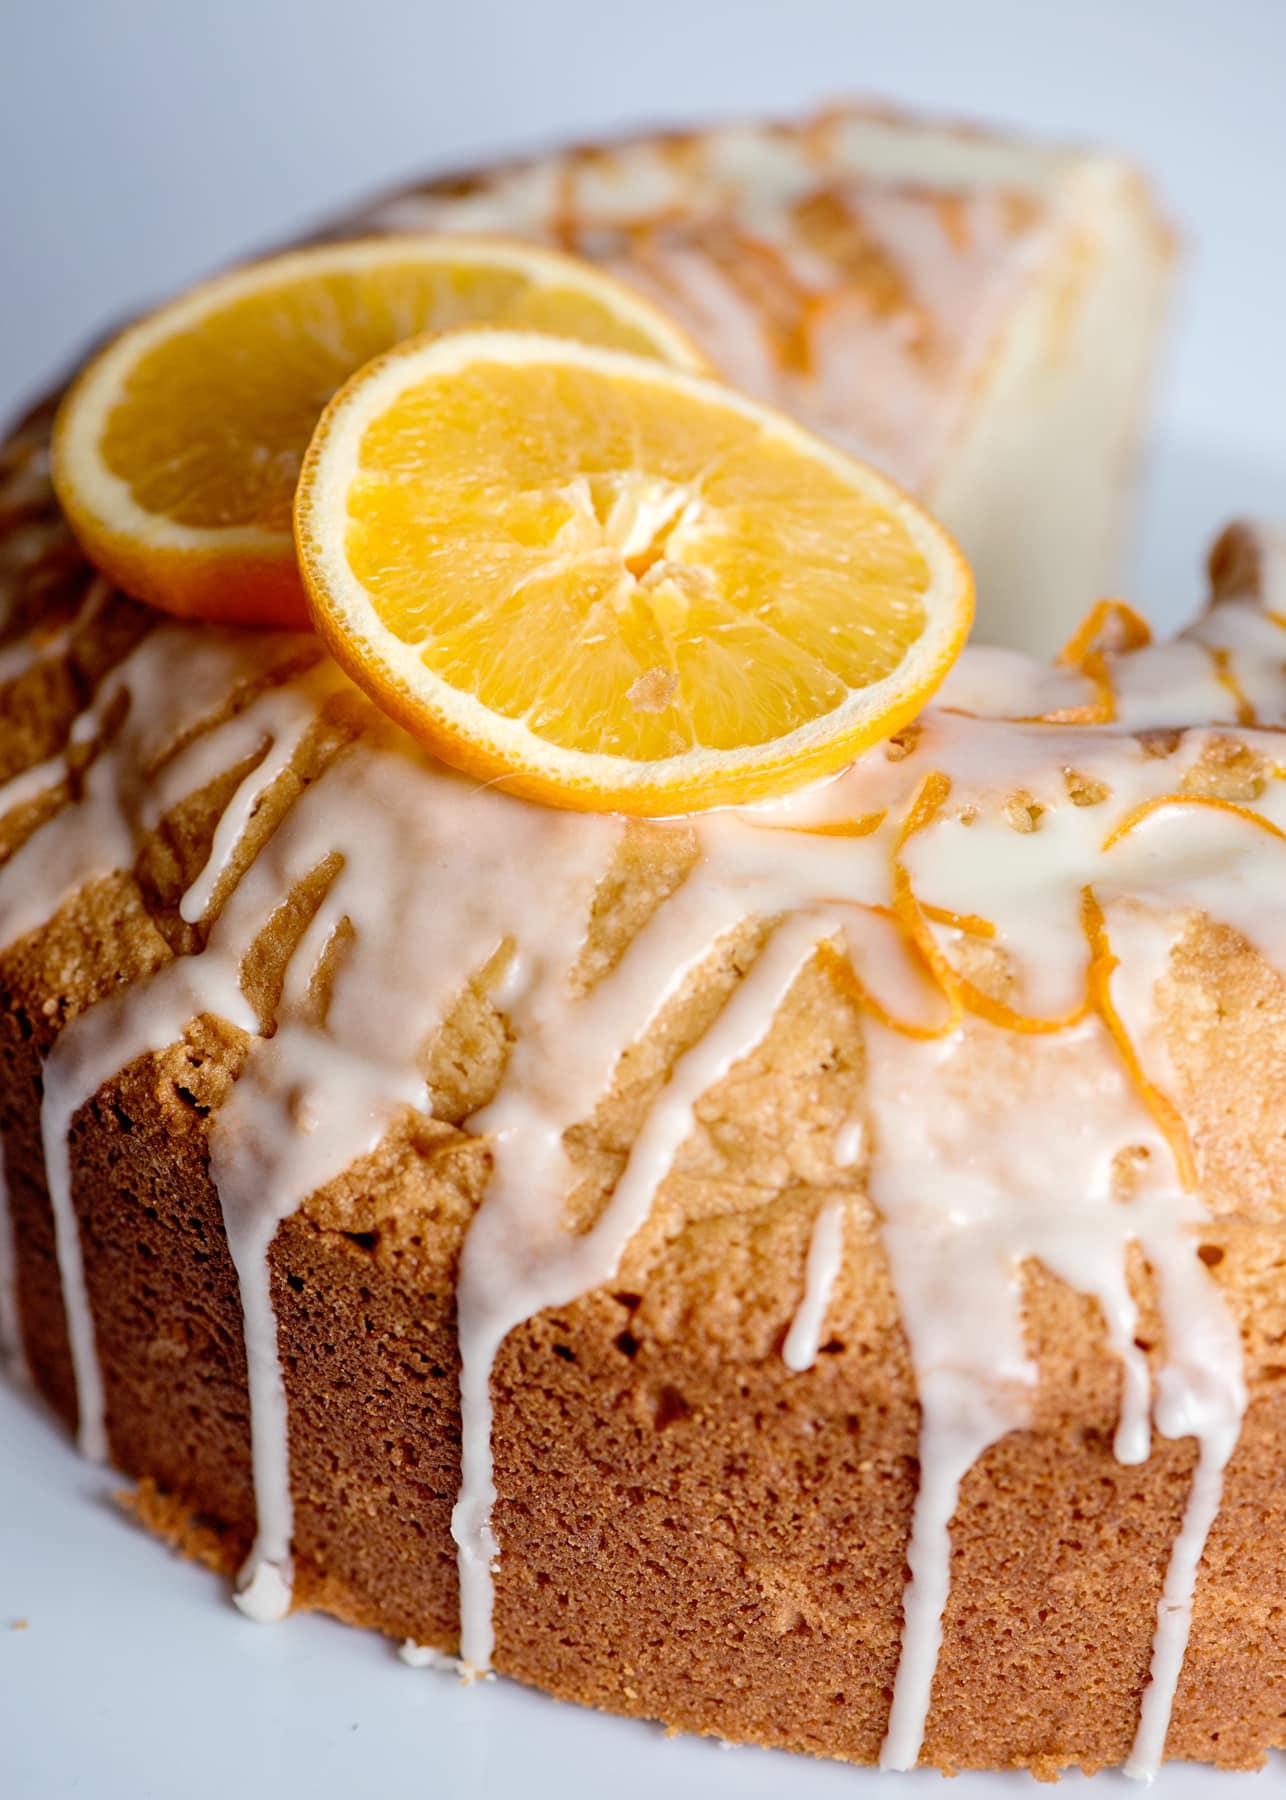 close up of orange pound cake with sliced oranges and glaze on top